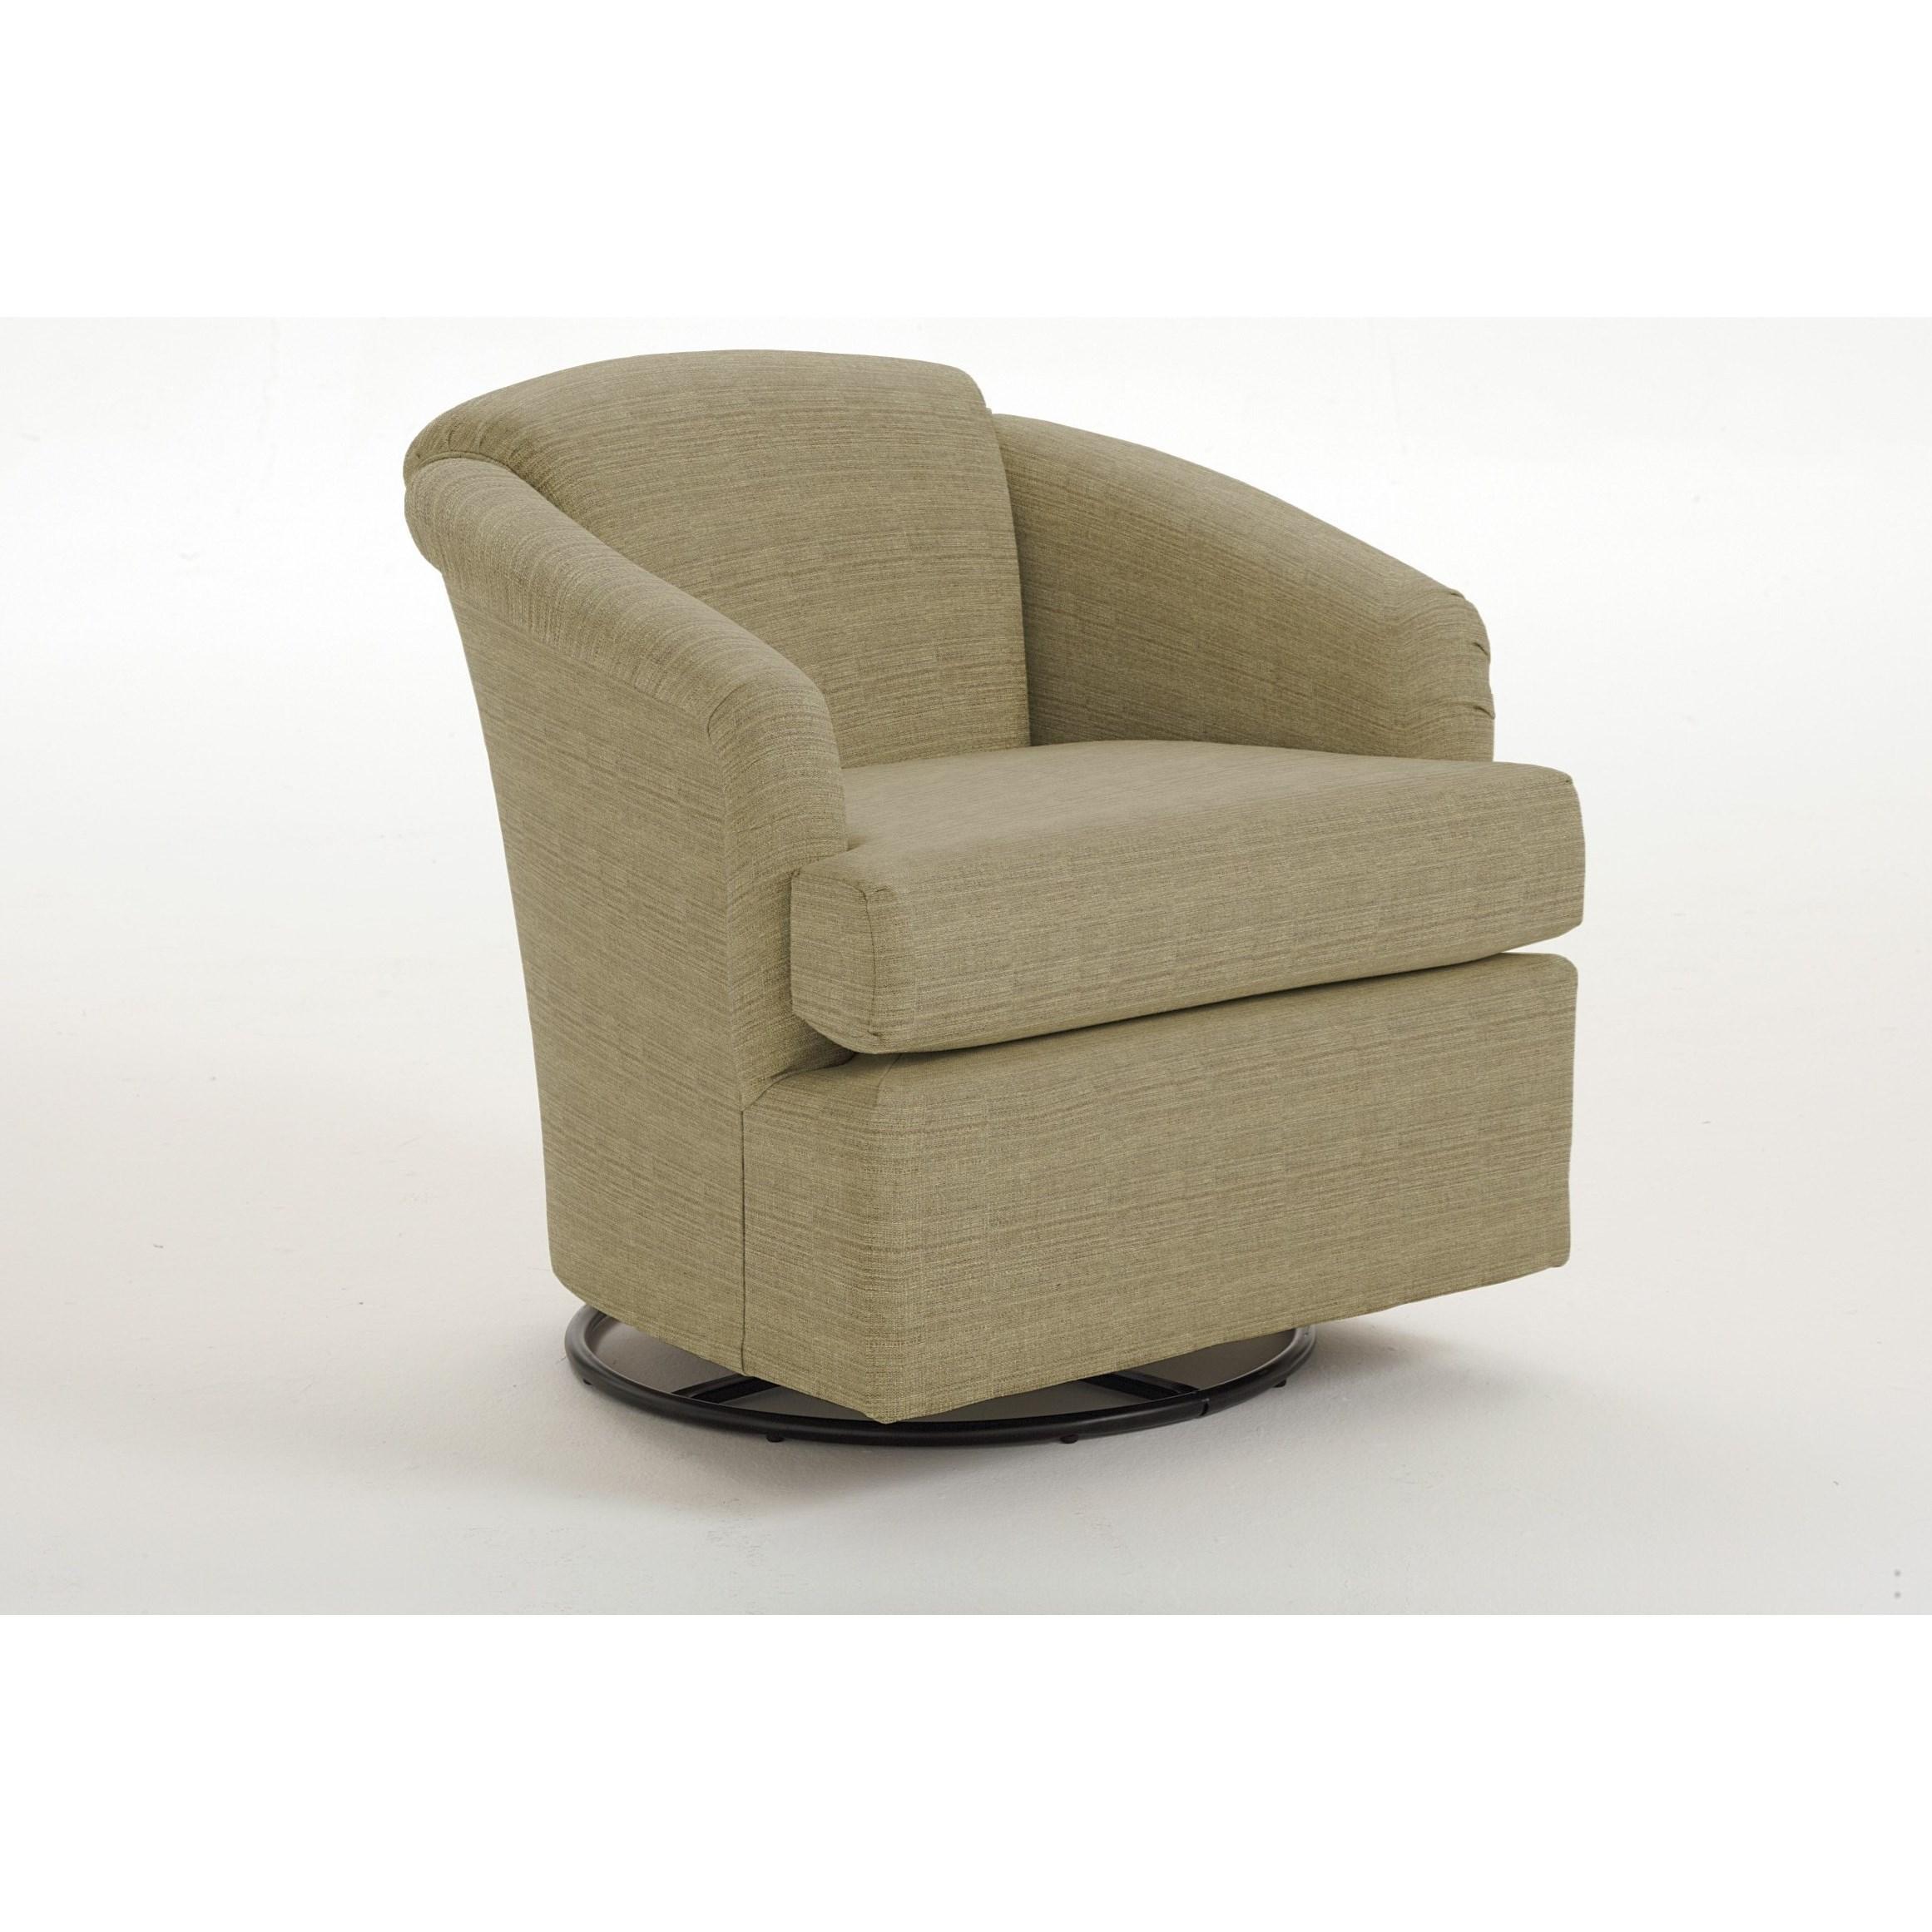 Chairs - Swivel Barrel Cass Swivel Barrel Chair by Best Home Furnishings at Lucas Furniture & Mattress